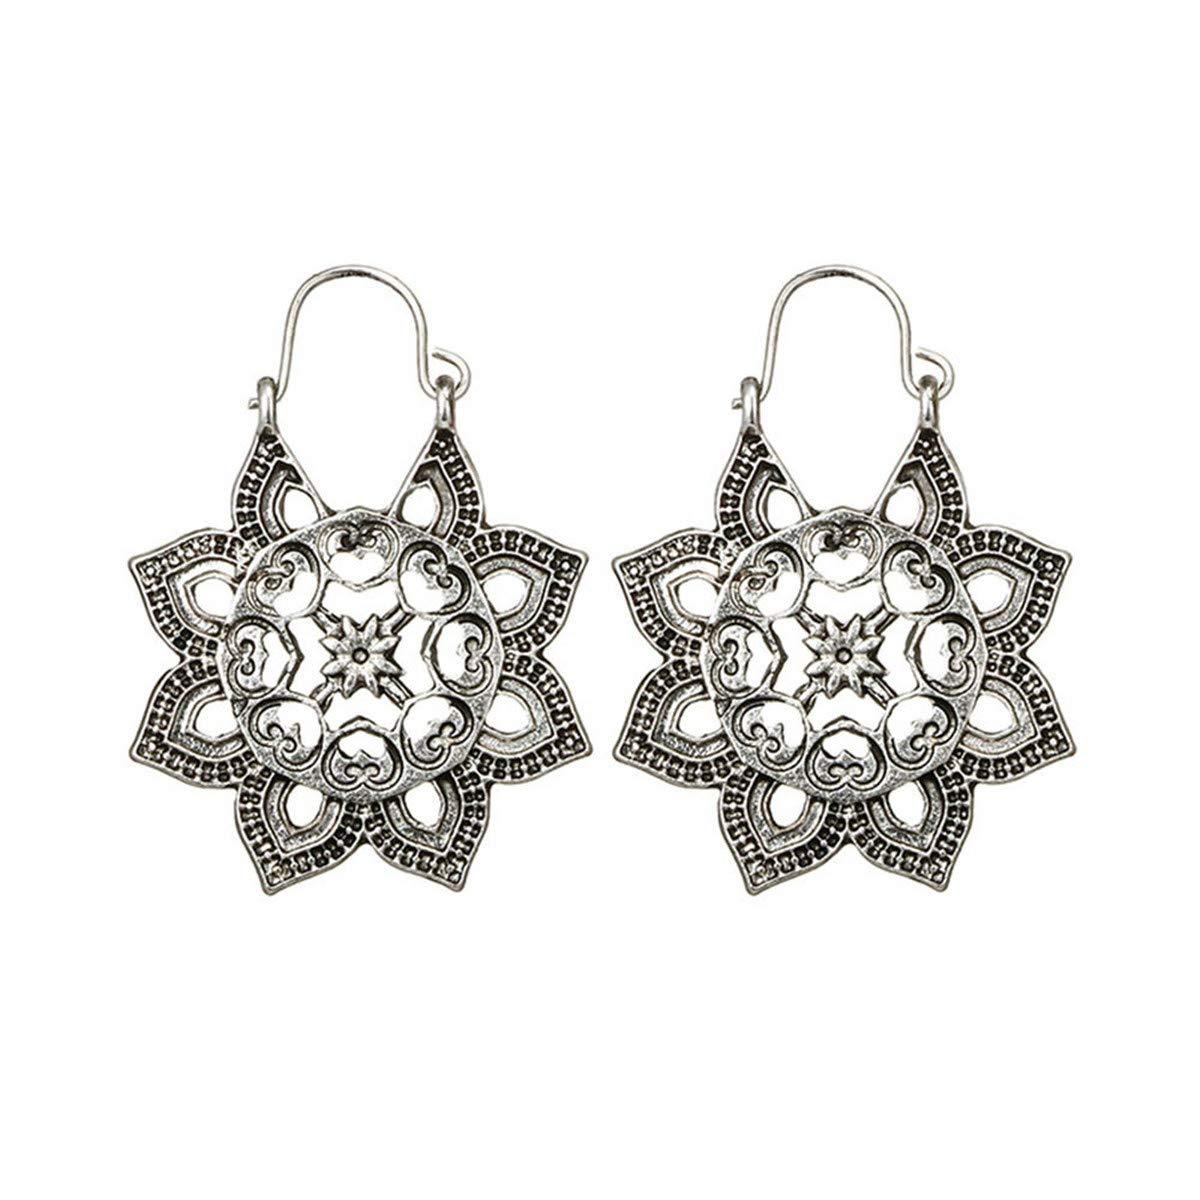 Ear Cuffs Hoop Fzitimx Antique Silver Gypsy Indian Tribal Ethnic Hoop Dangle Mandala Earrings Boho